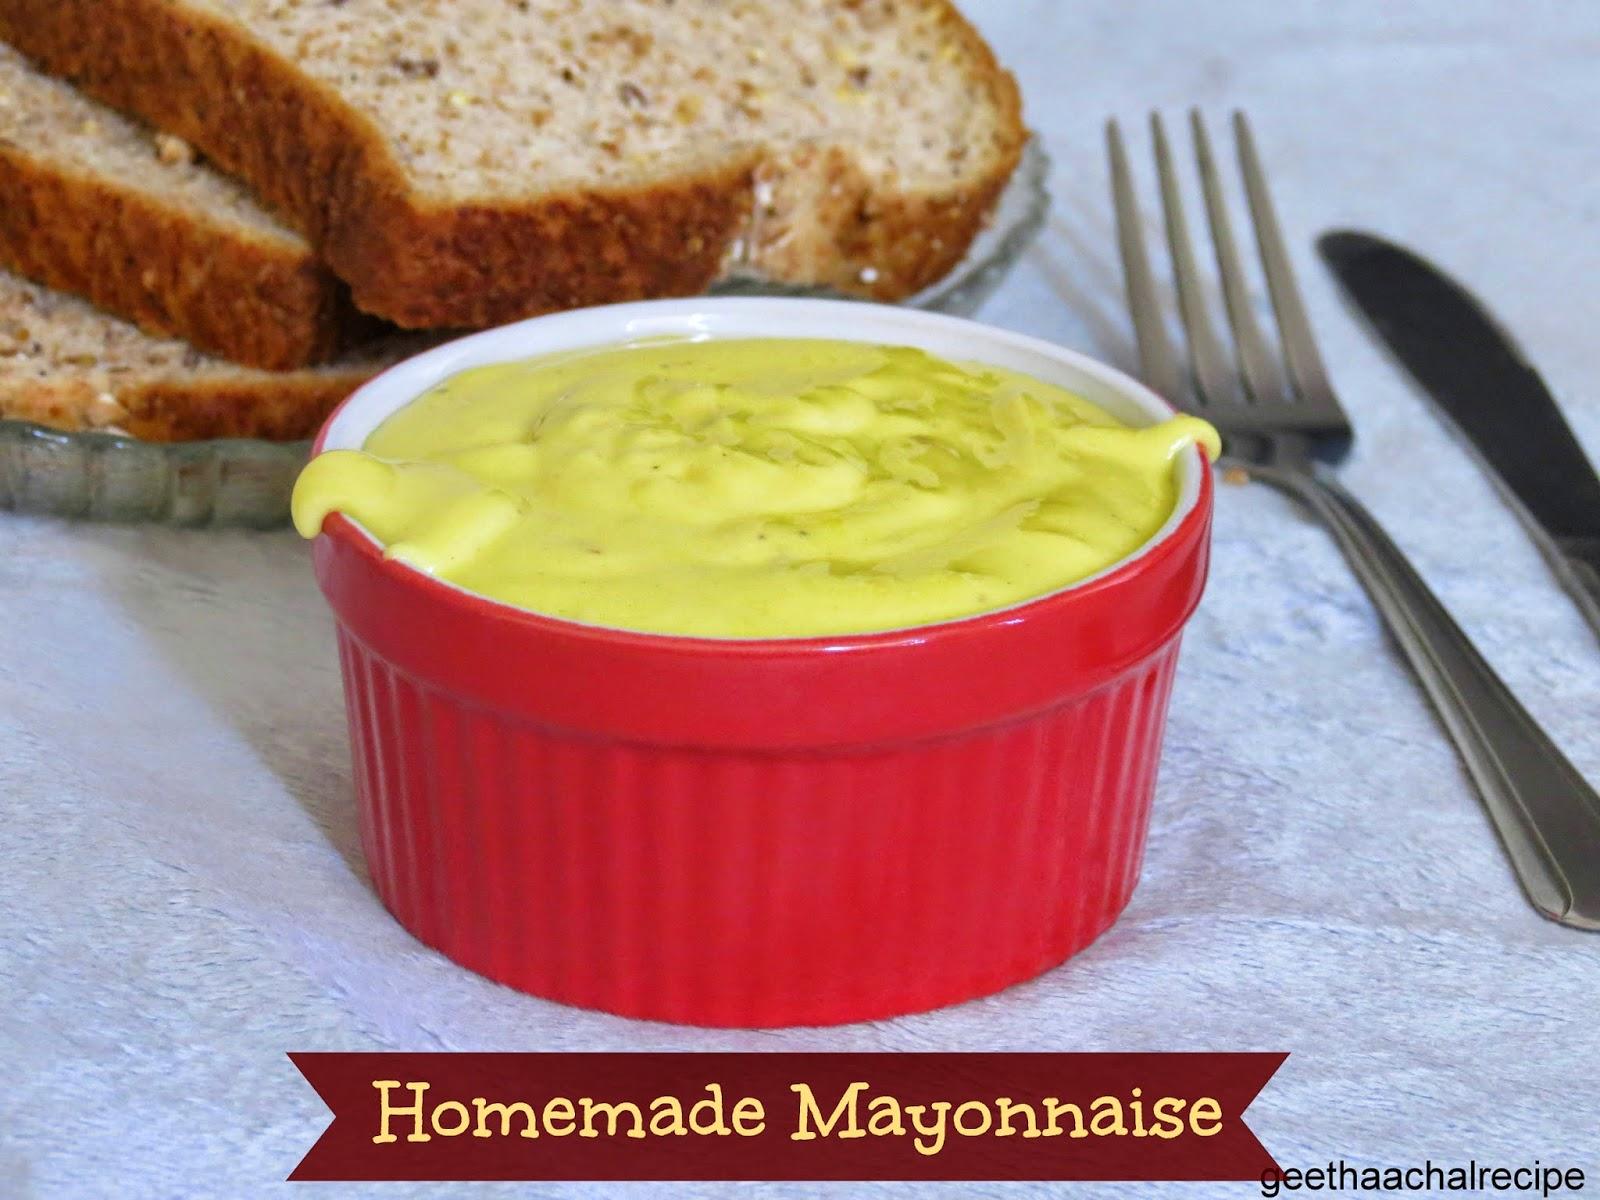 ... - Homemade Mayonnaise Recipe - Mayo using Olive oil